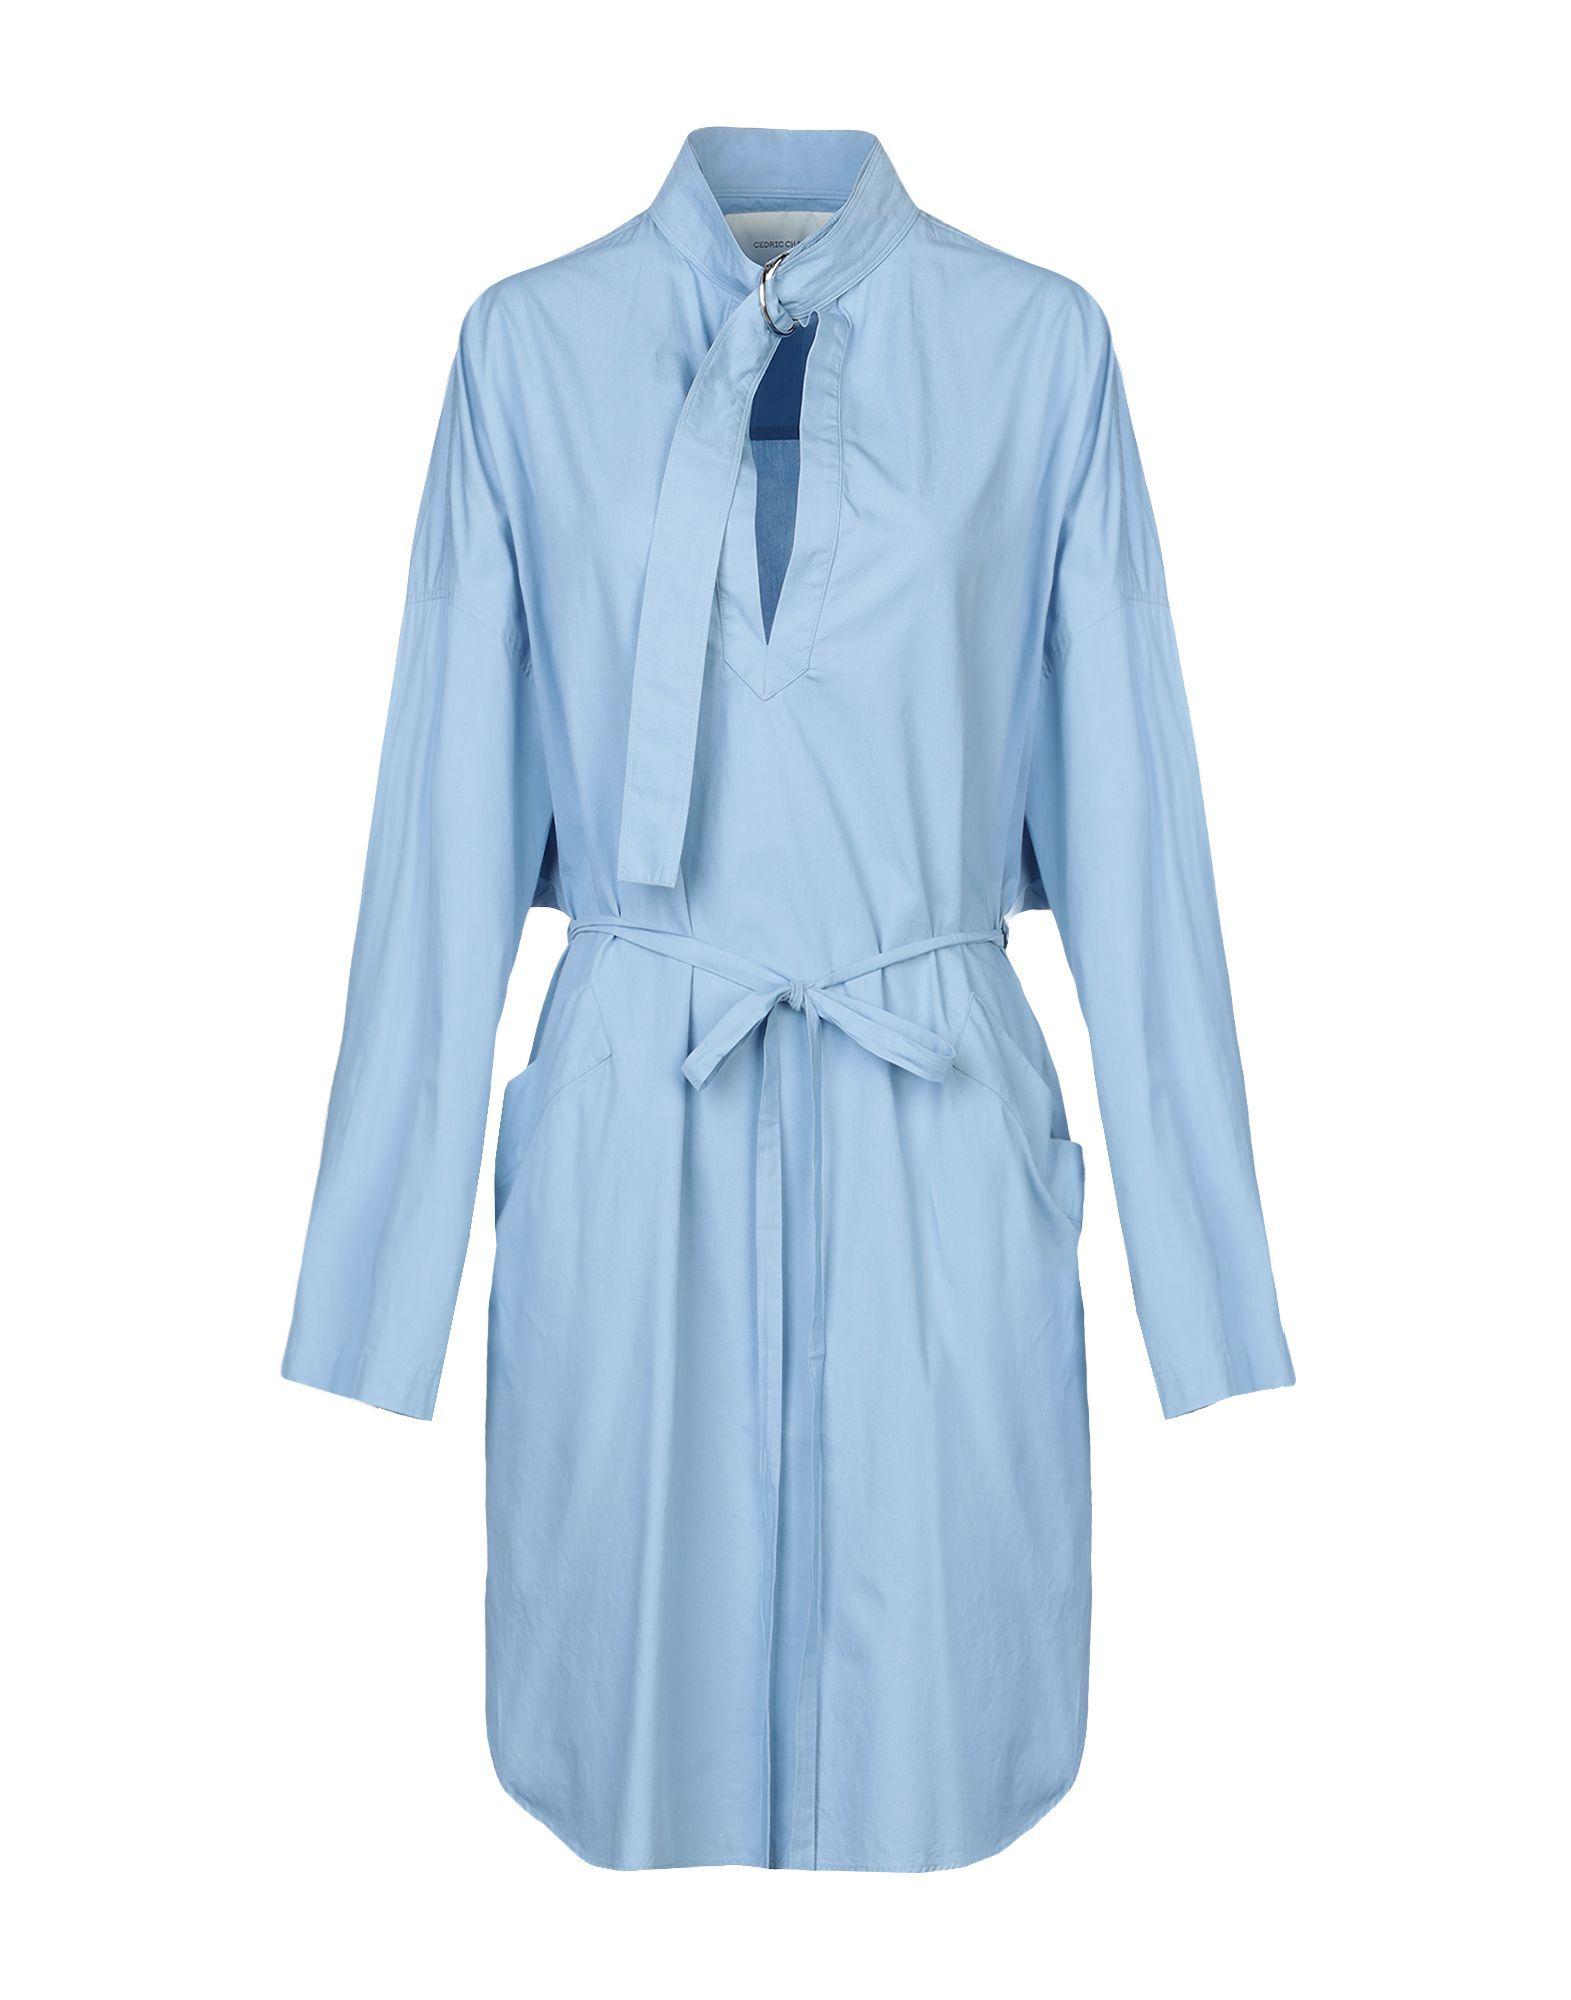 Cedric Charlier Pastel Blue Cotton Dress